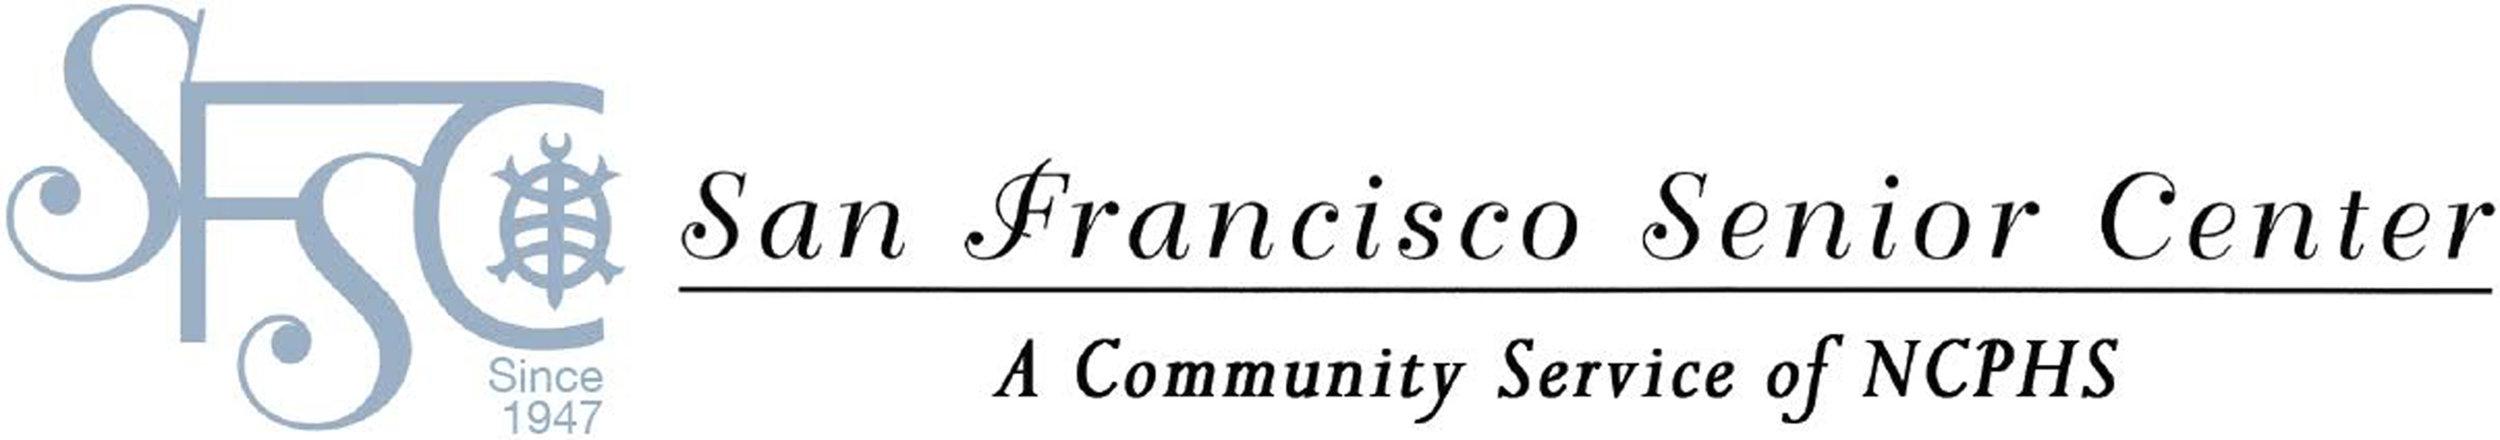 SFSC-Logo-8000-by.jpg